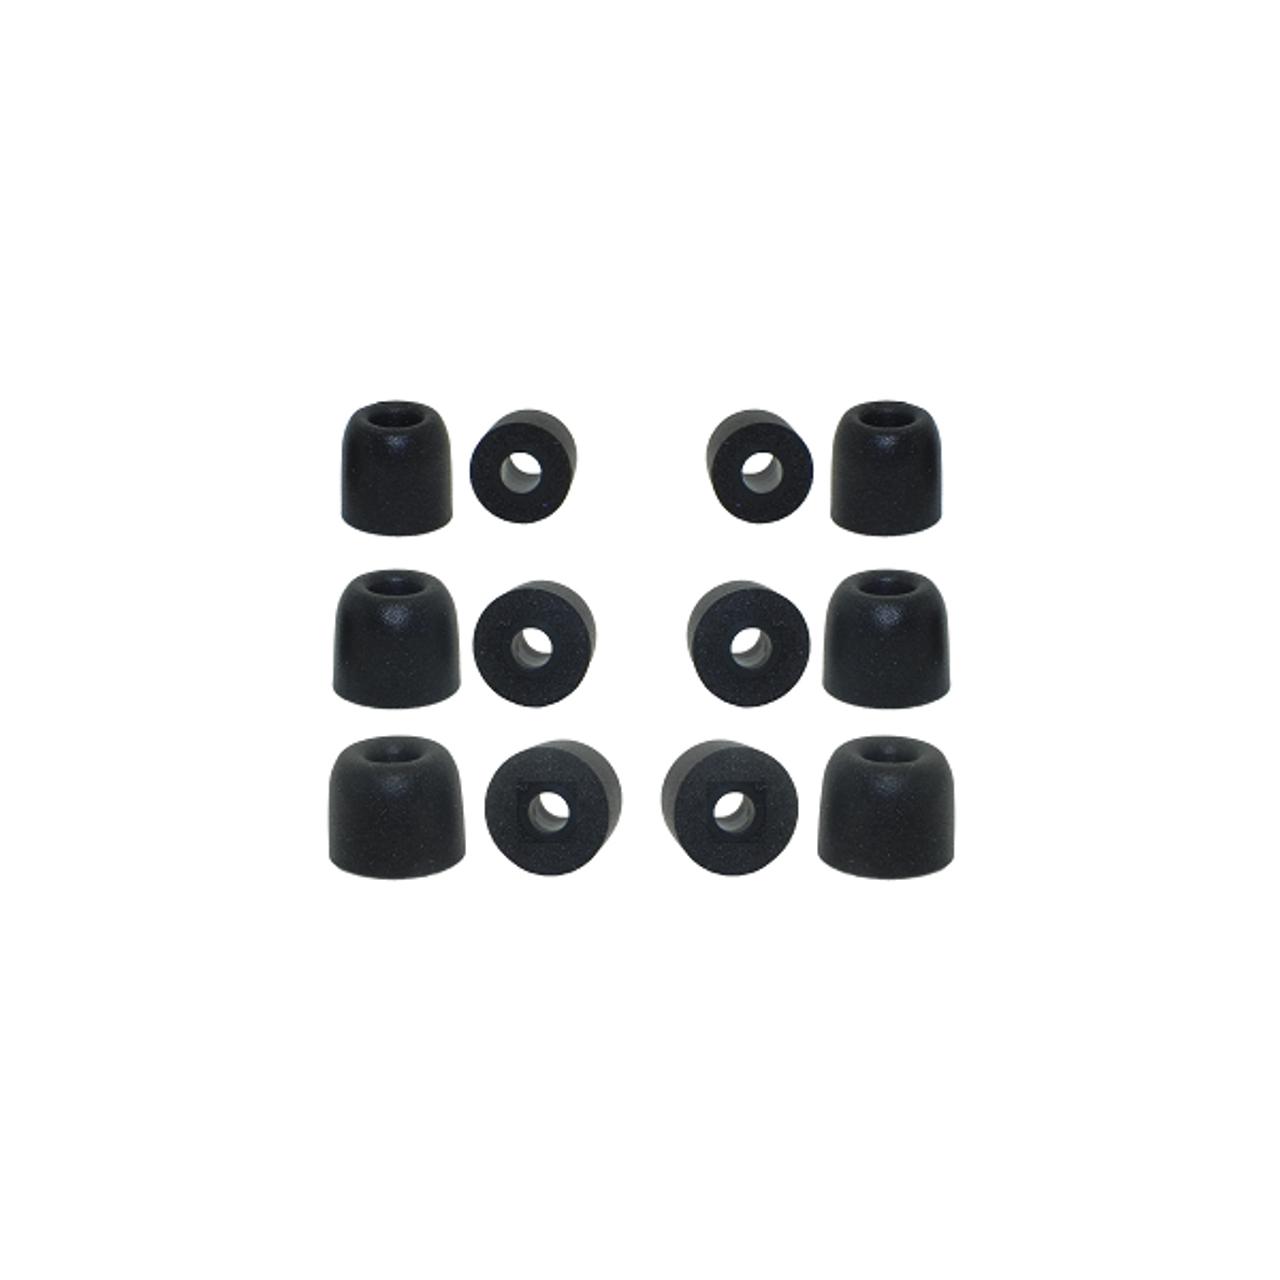 memory foam eartips for Campfire Audio ear tips